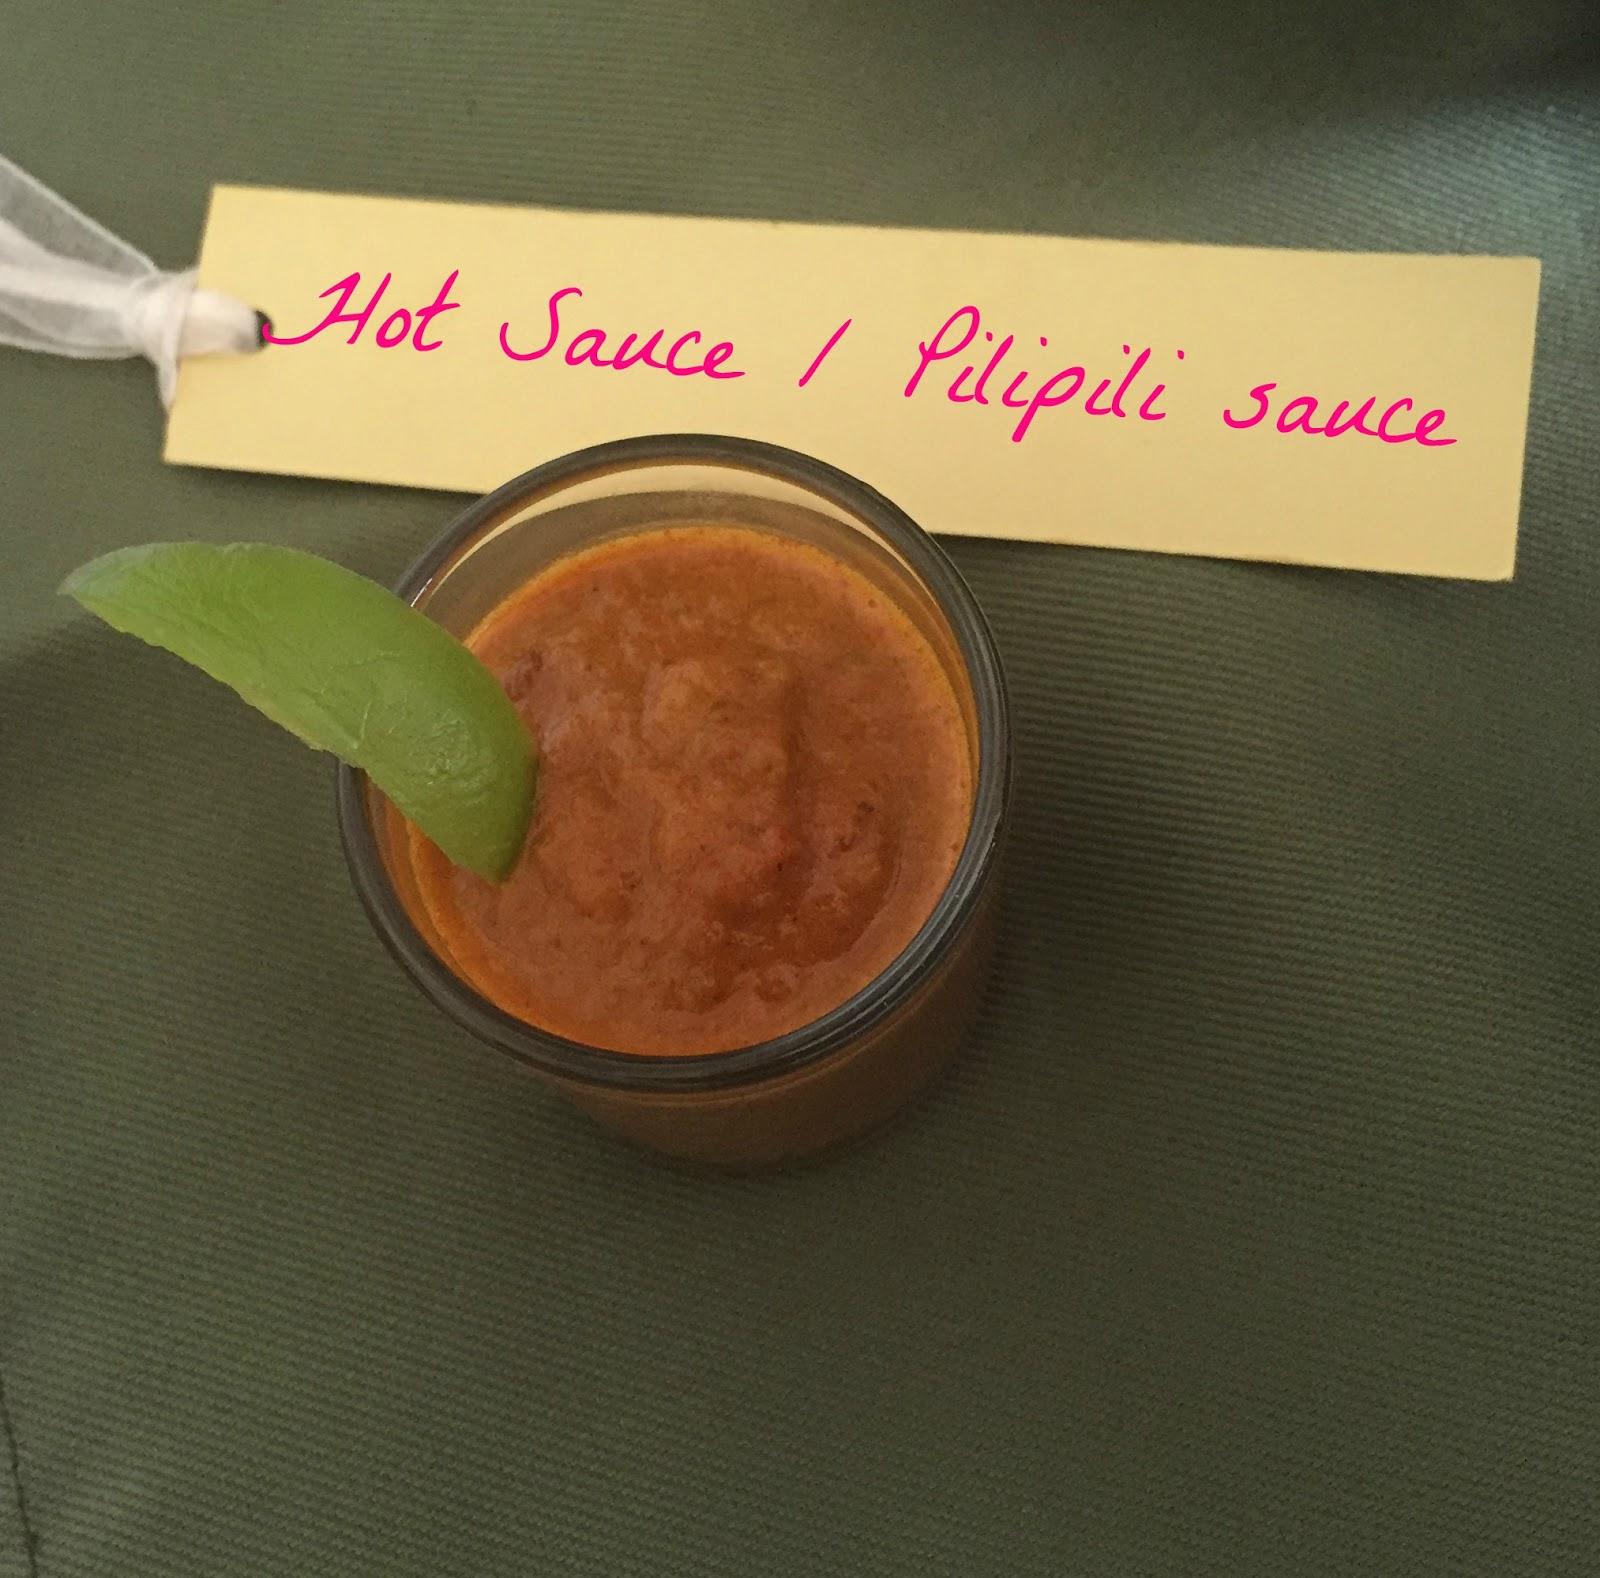 sauce hot fudge sauce teriyaki sauce bolognese sauce pili pili hot